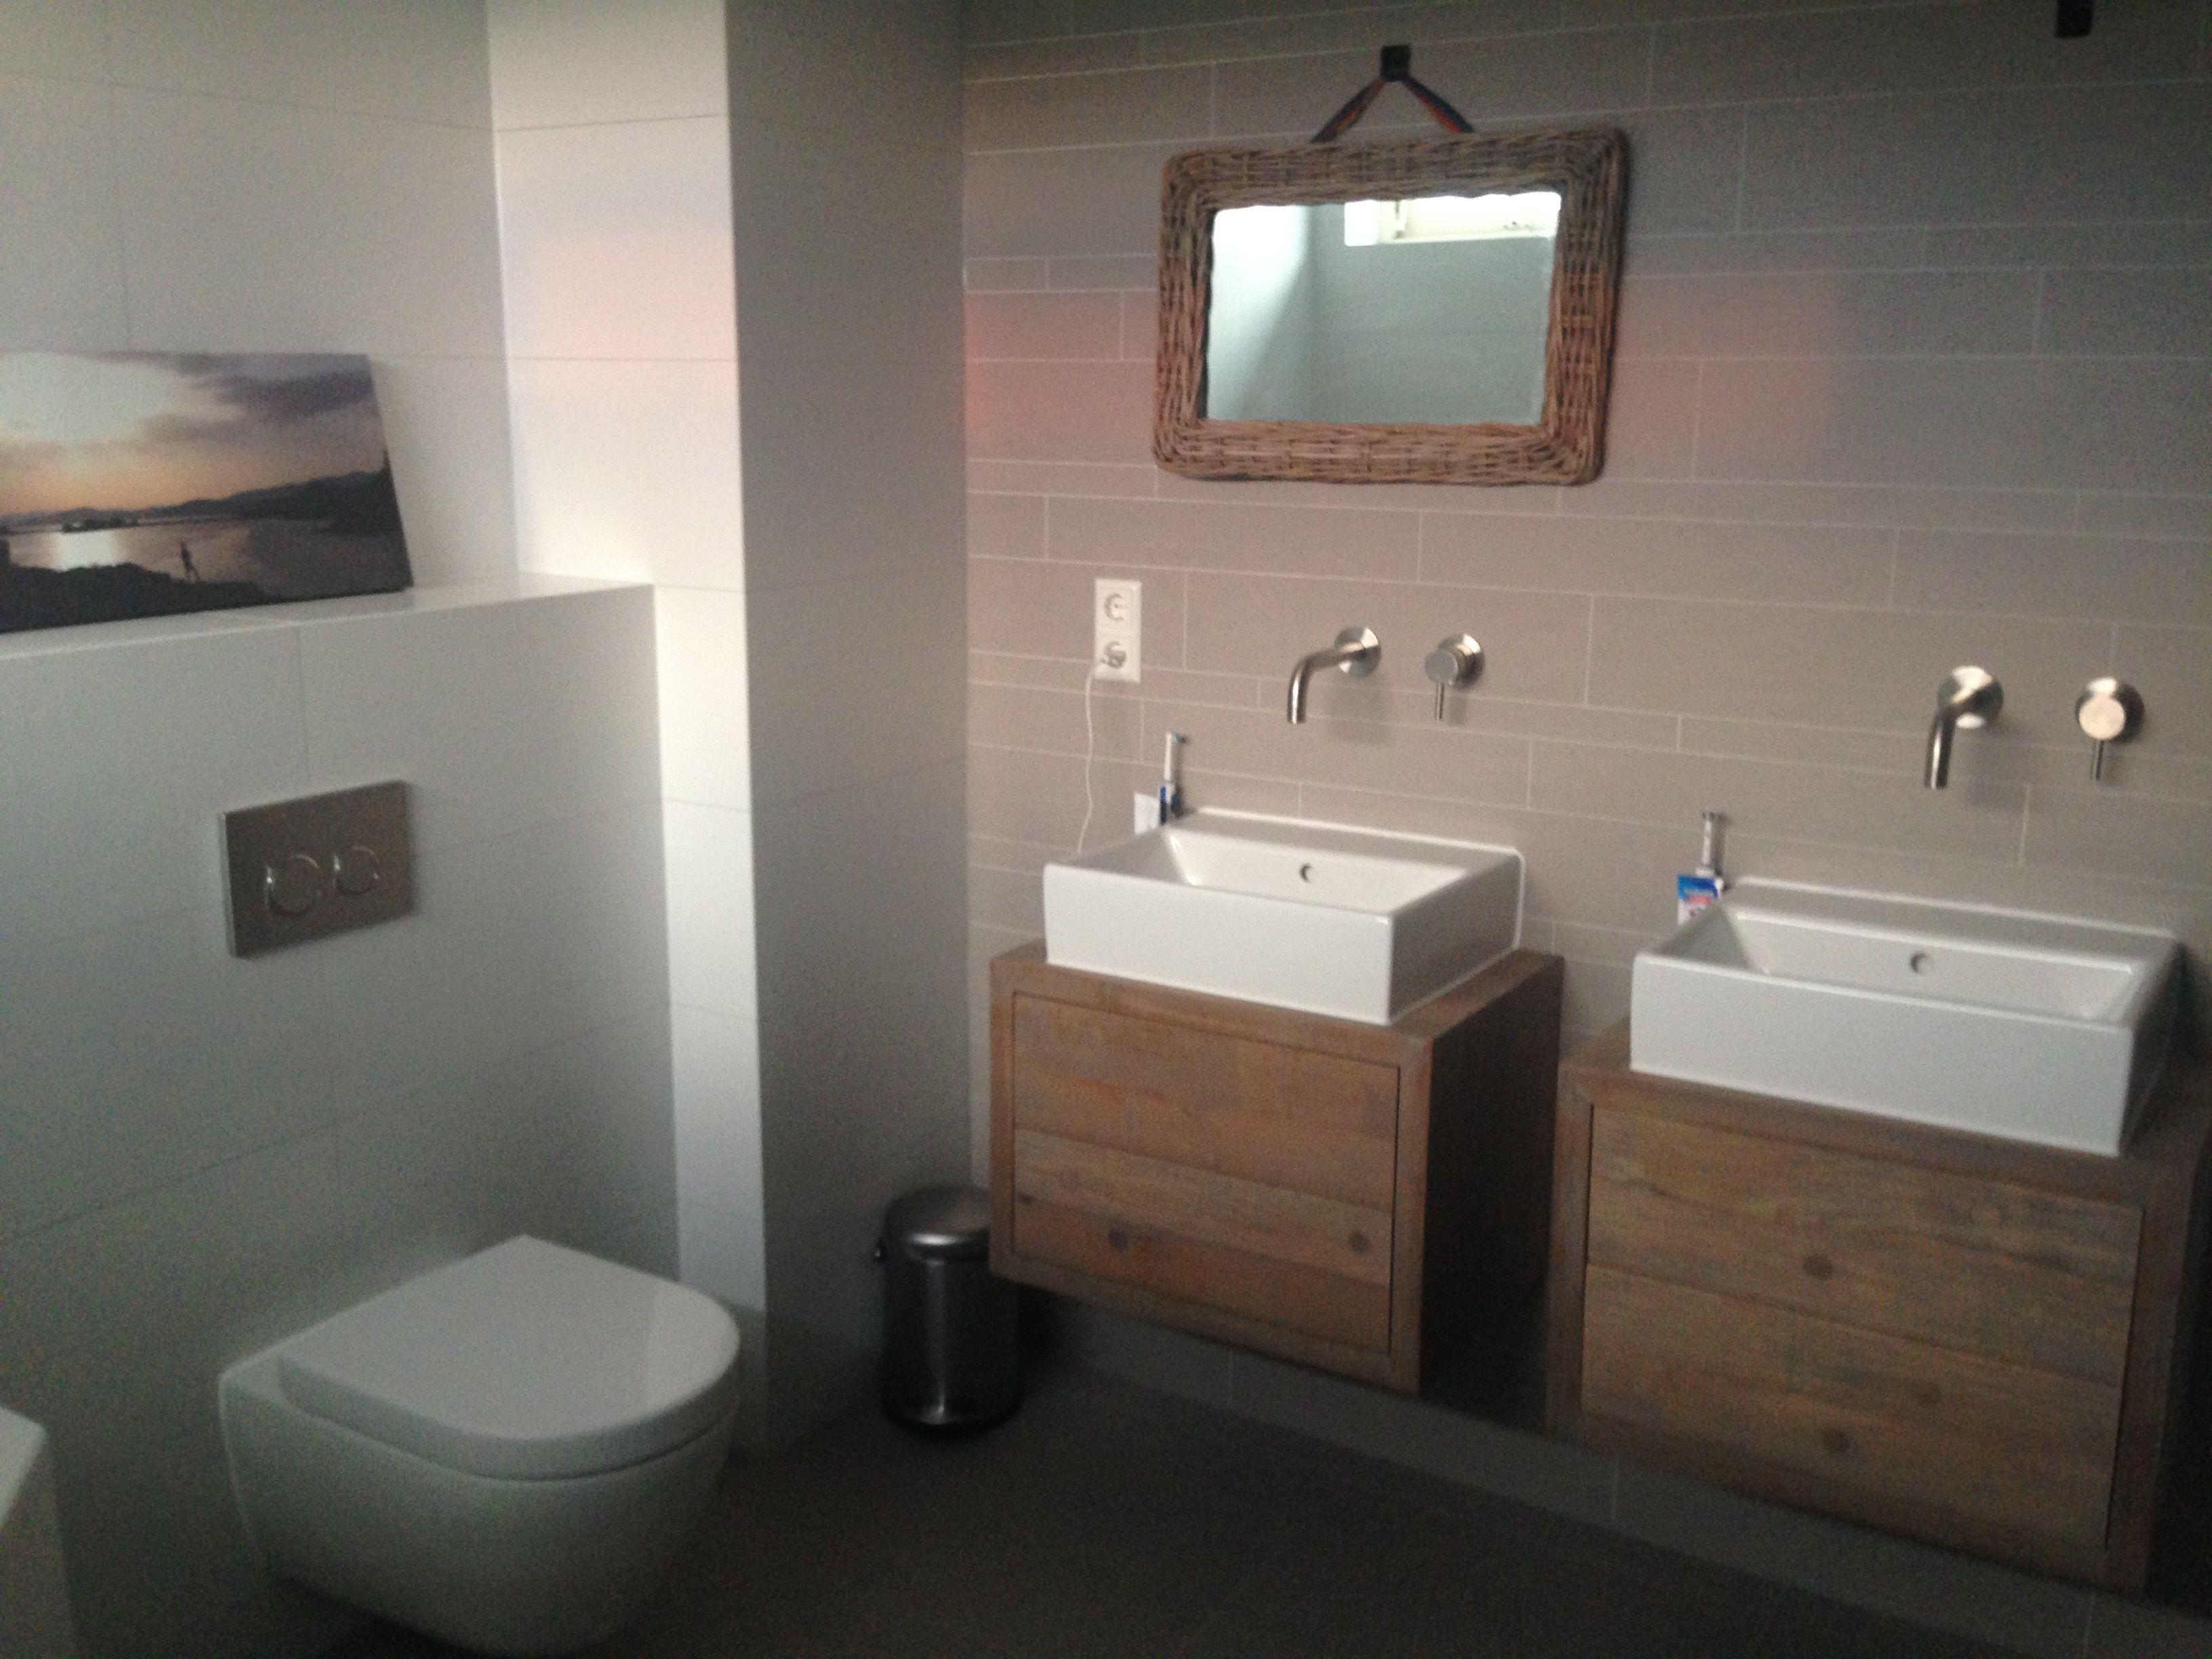 rak gpd 59 tegelstroken badkamer maes y dderwen pinterest